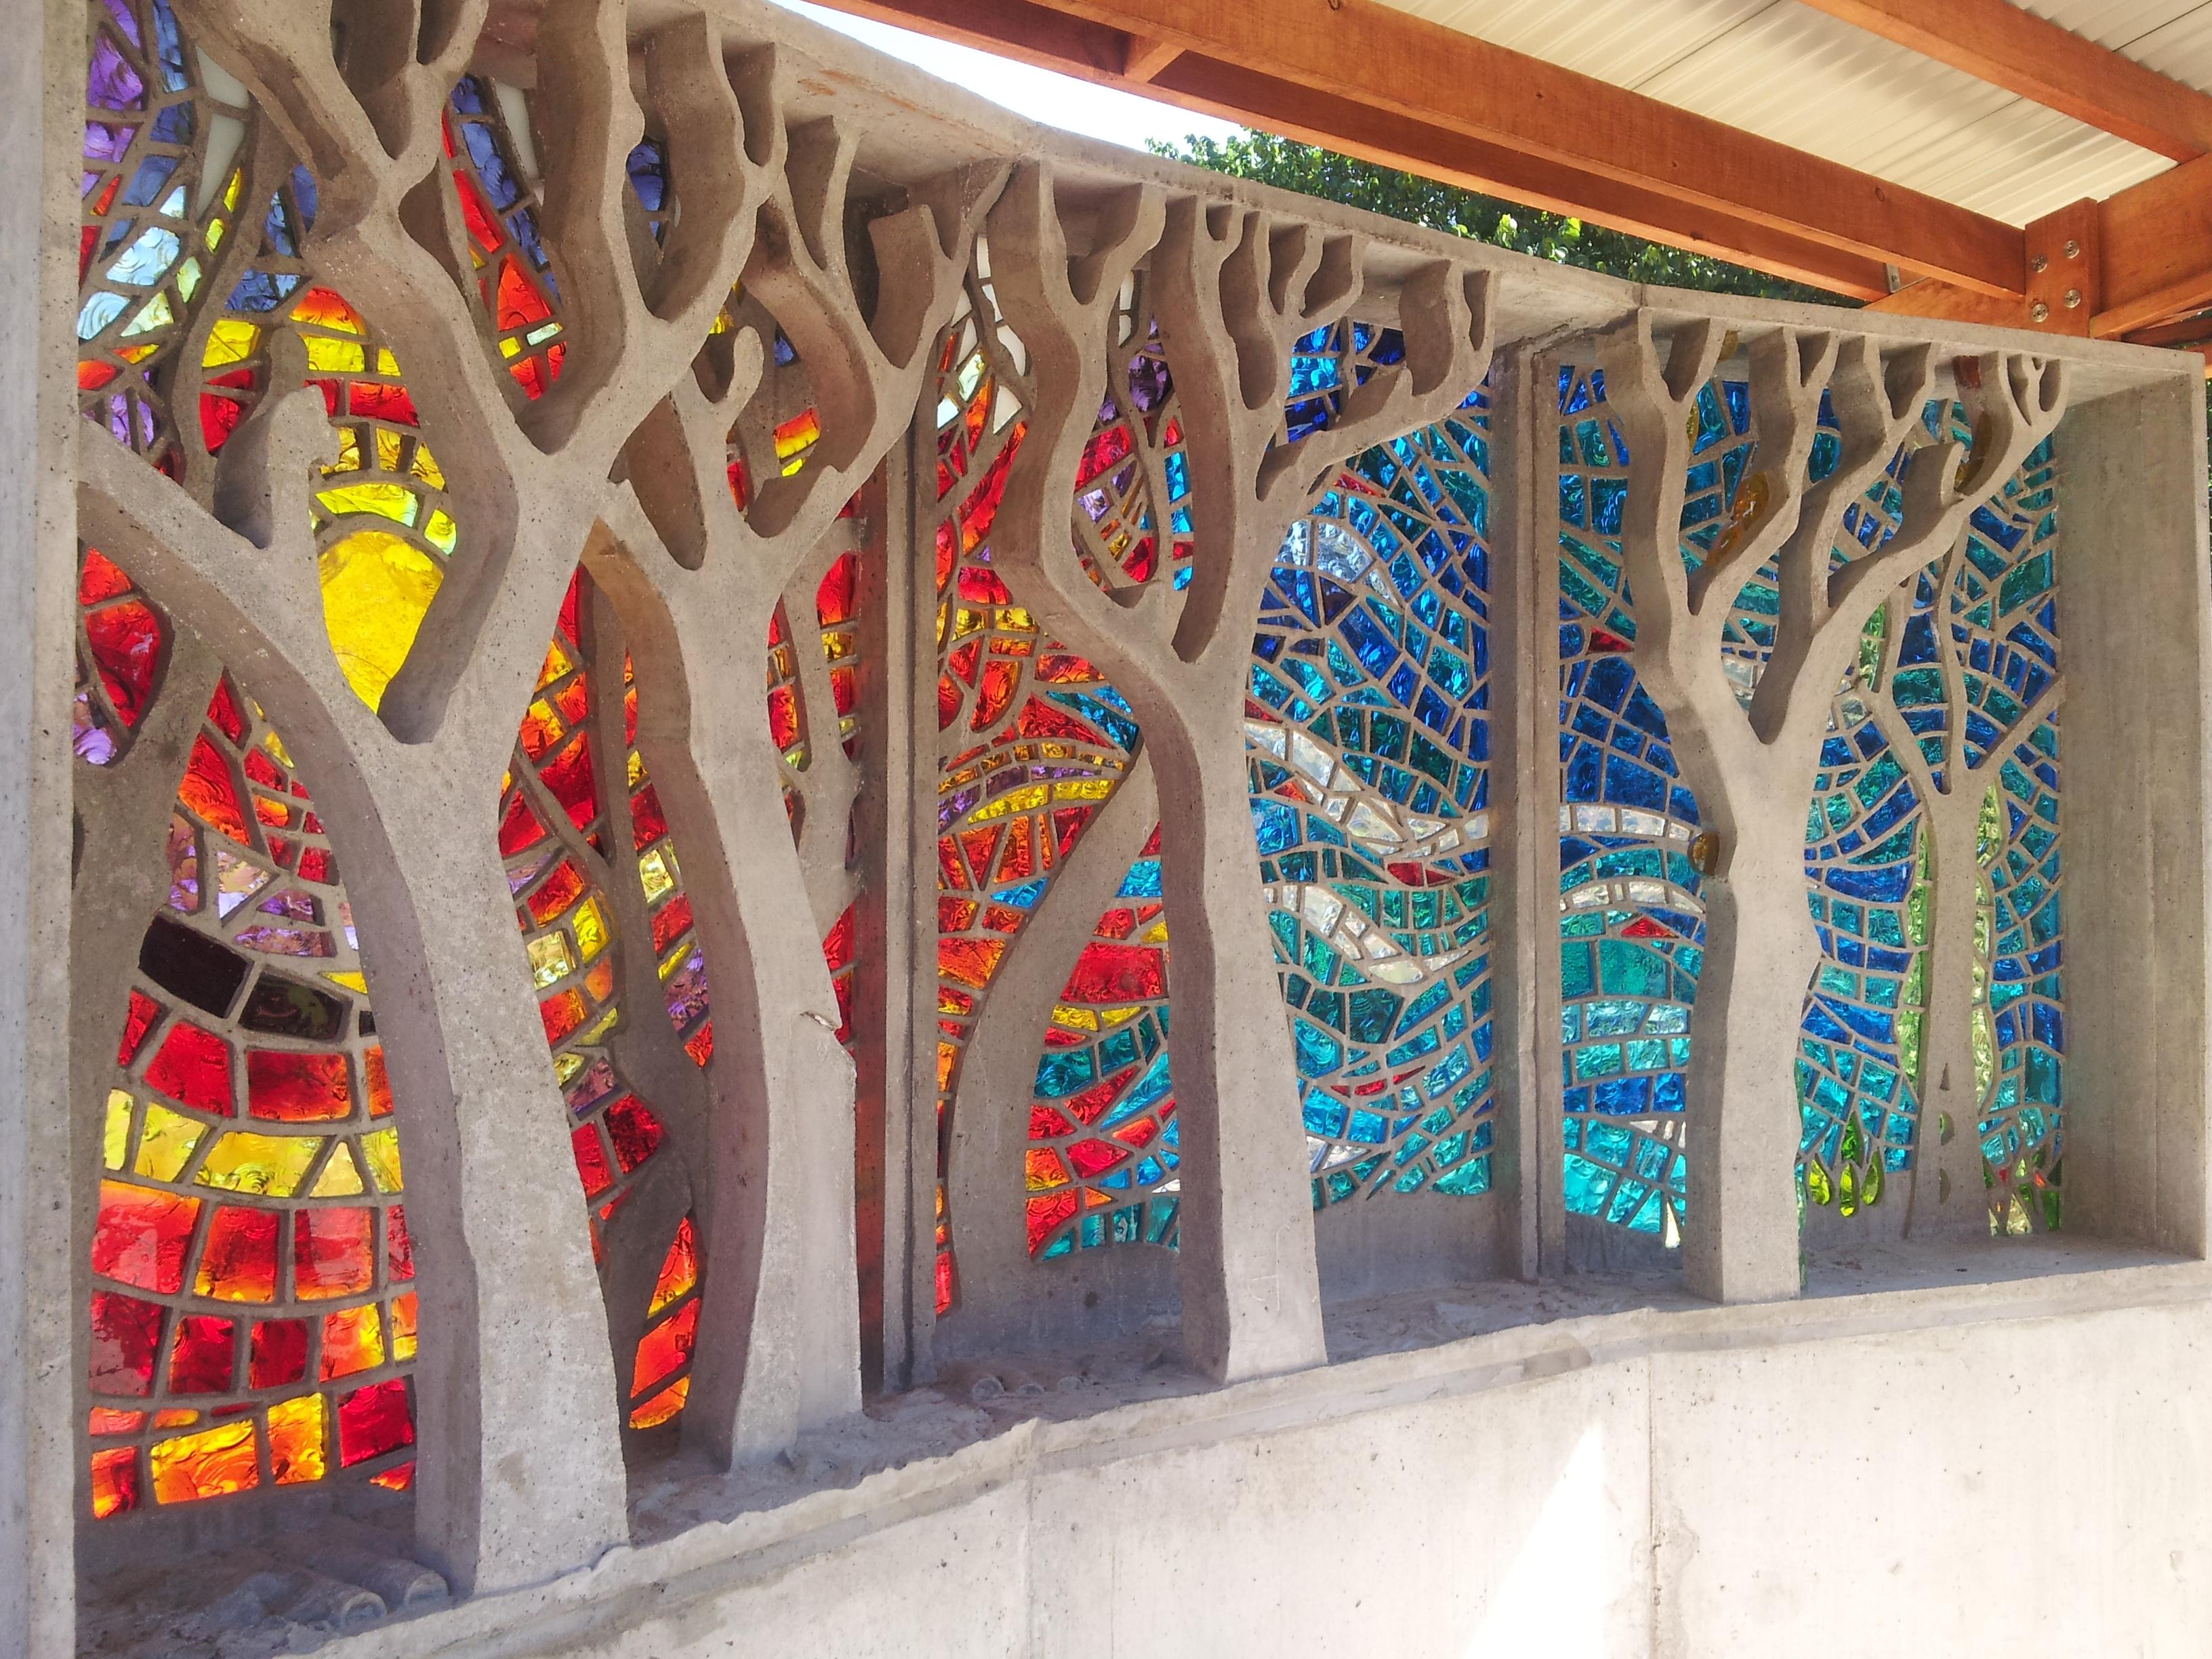 Bushfire memorial Yarra Glen